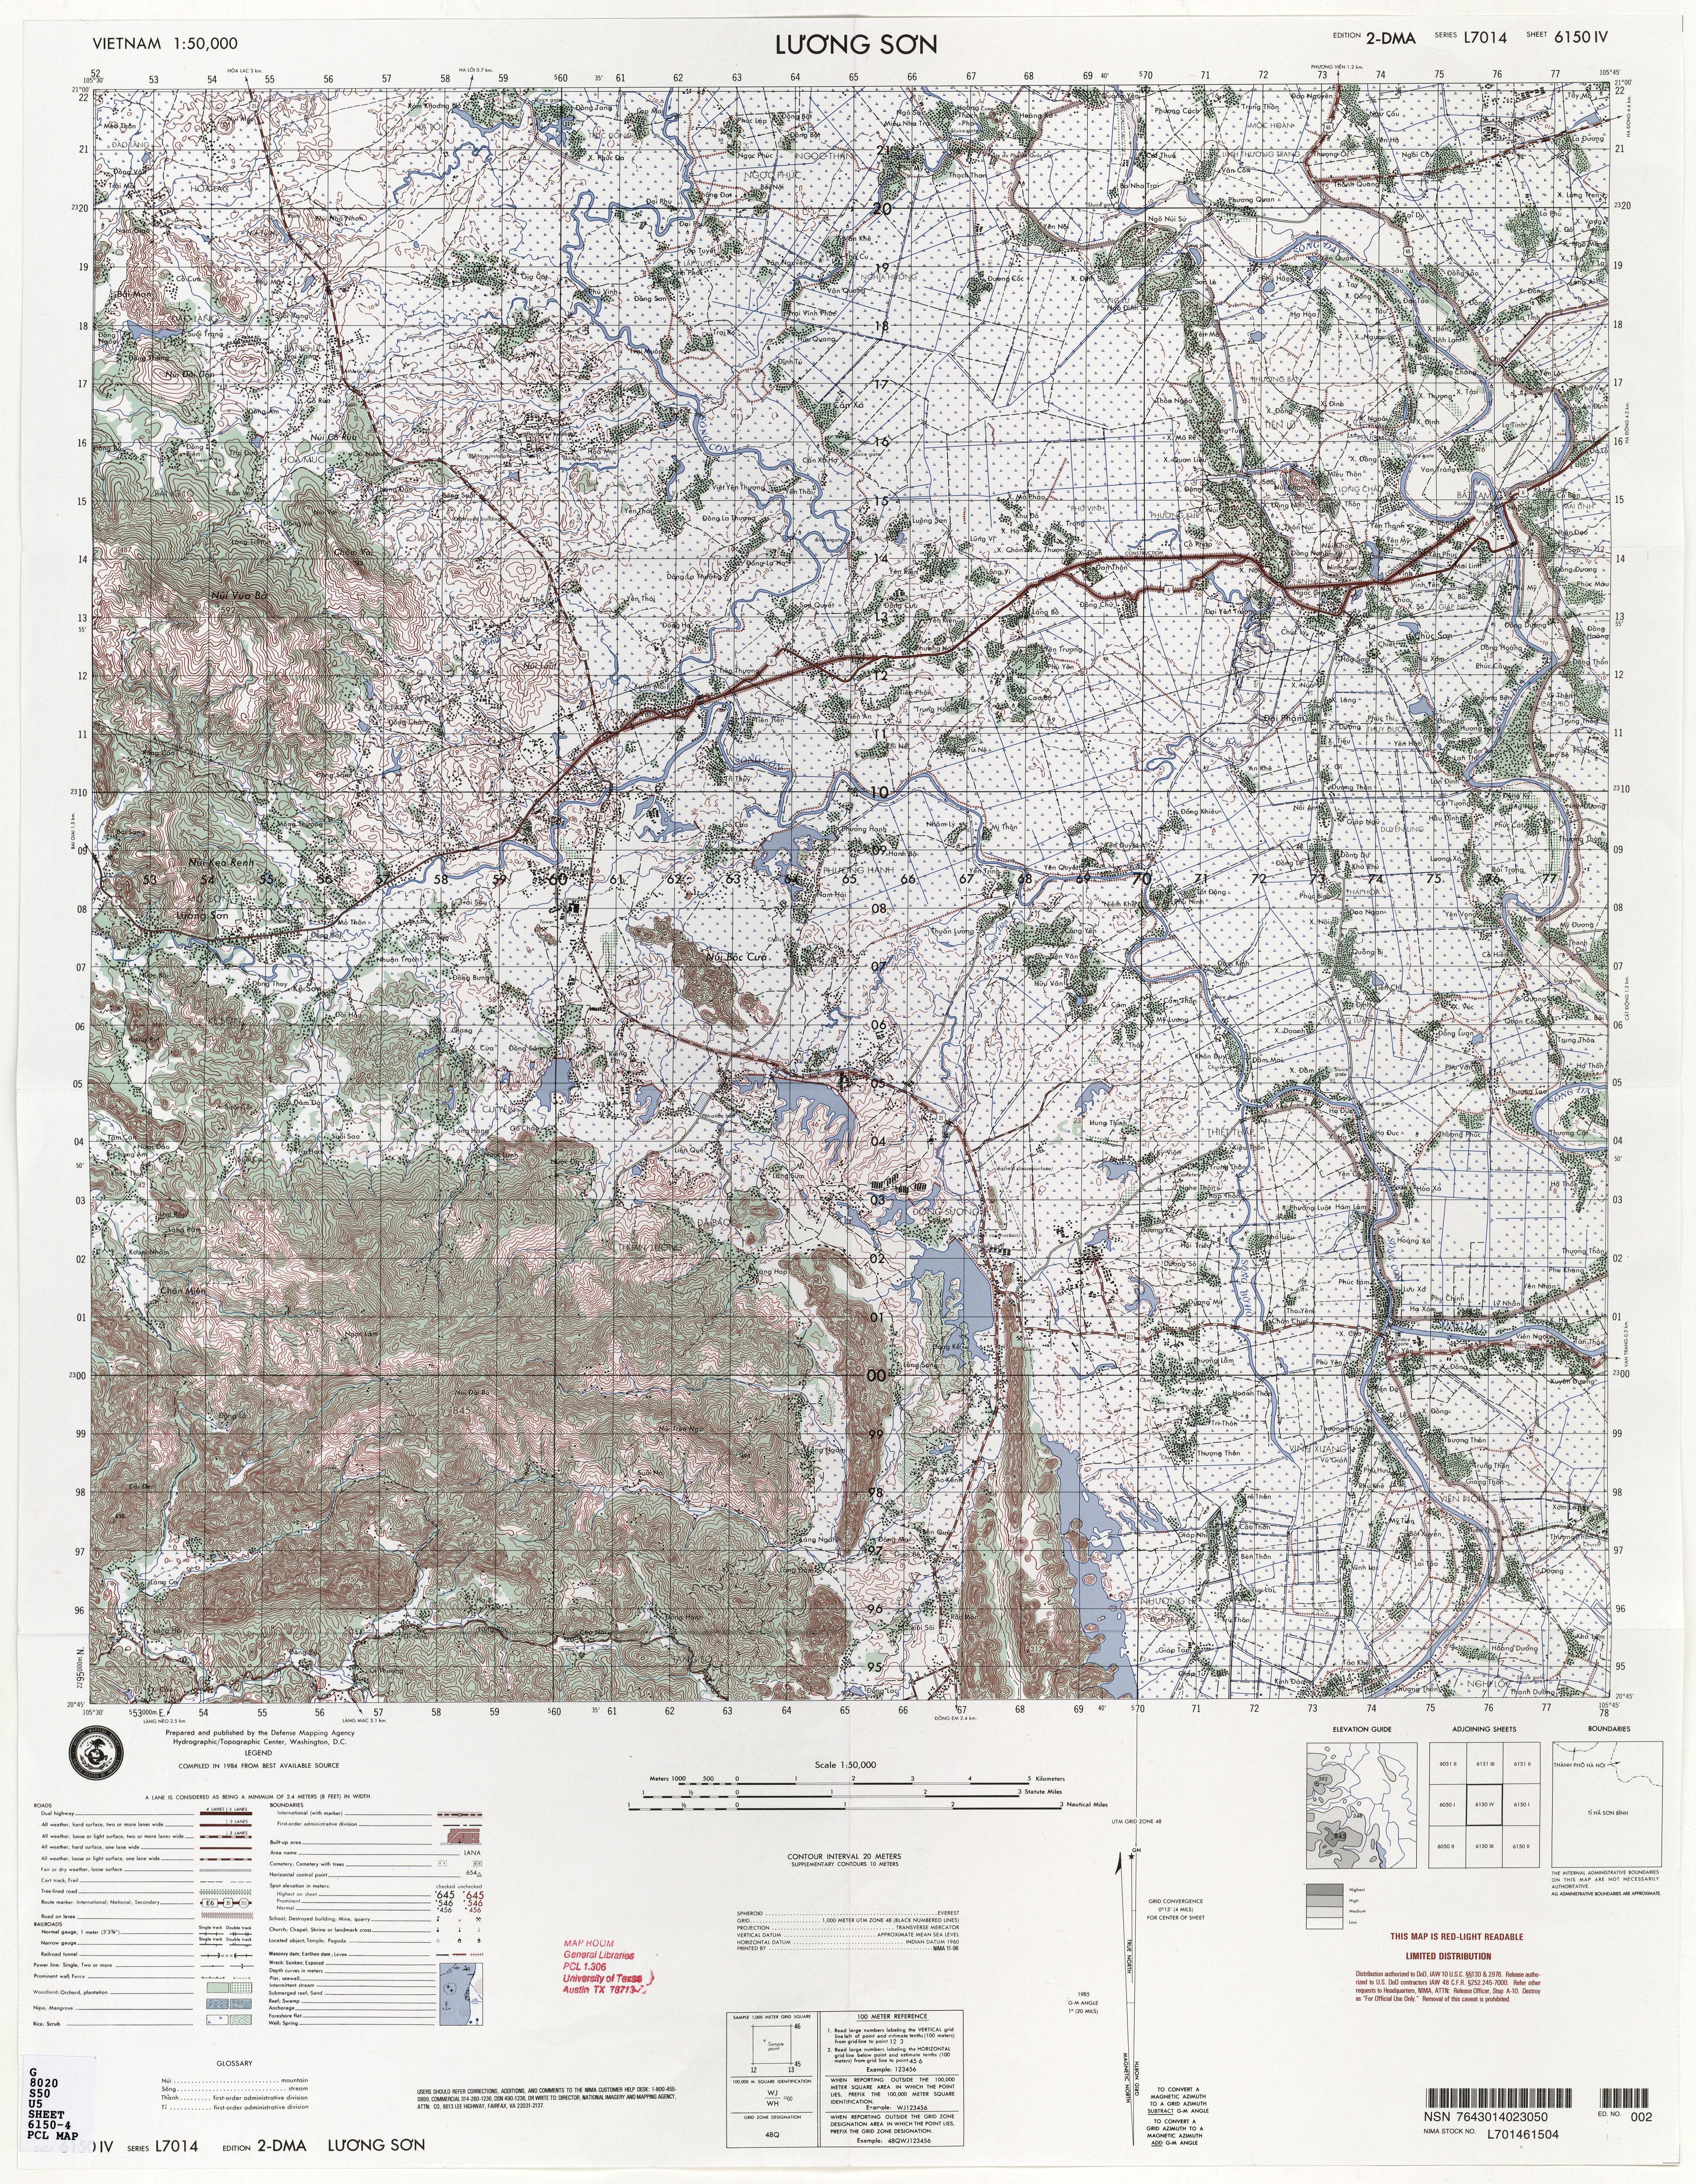 1 50 000 U S Defense Mapping Agency 1984 9 6mb Jpeg